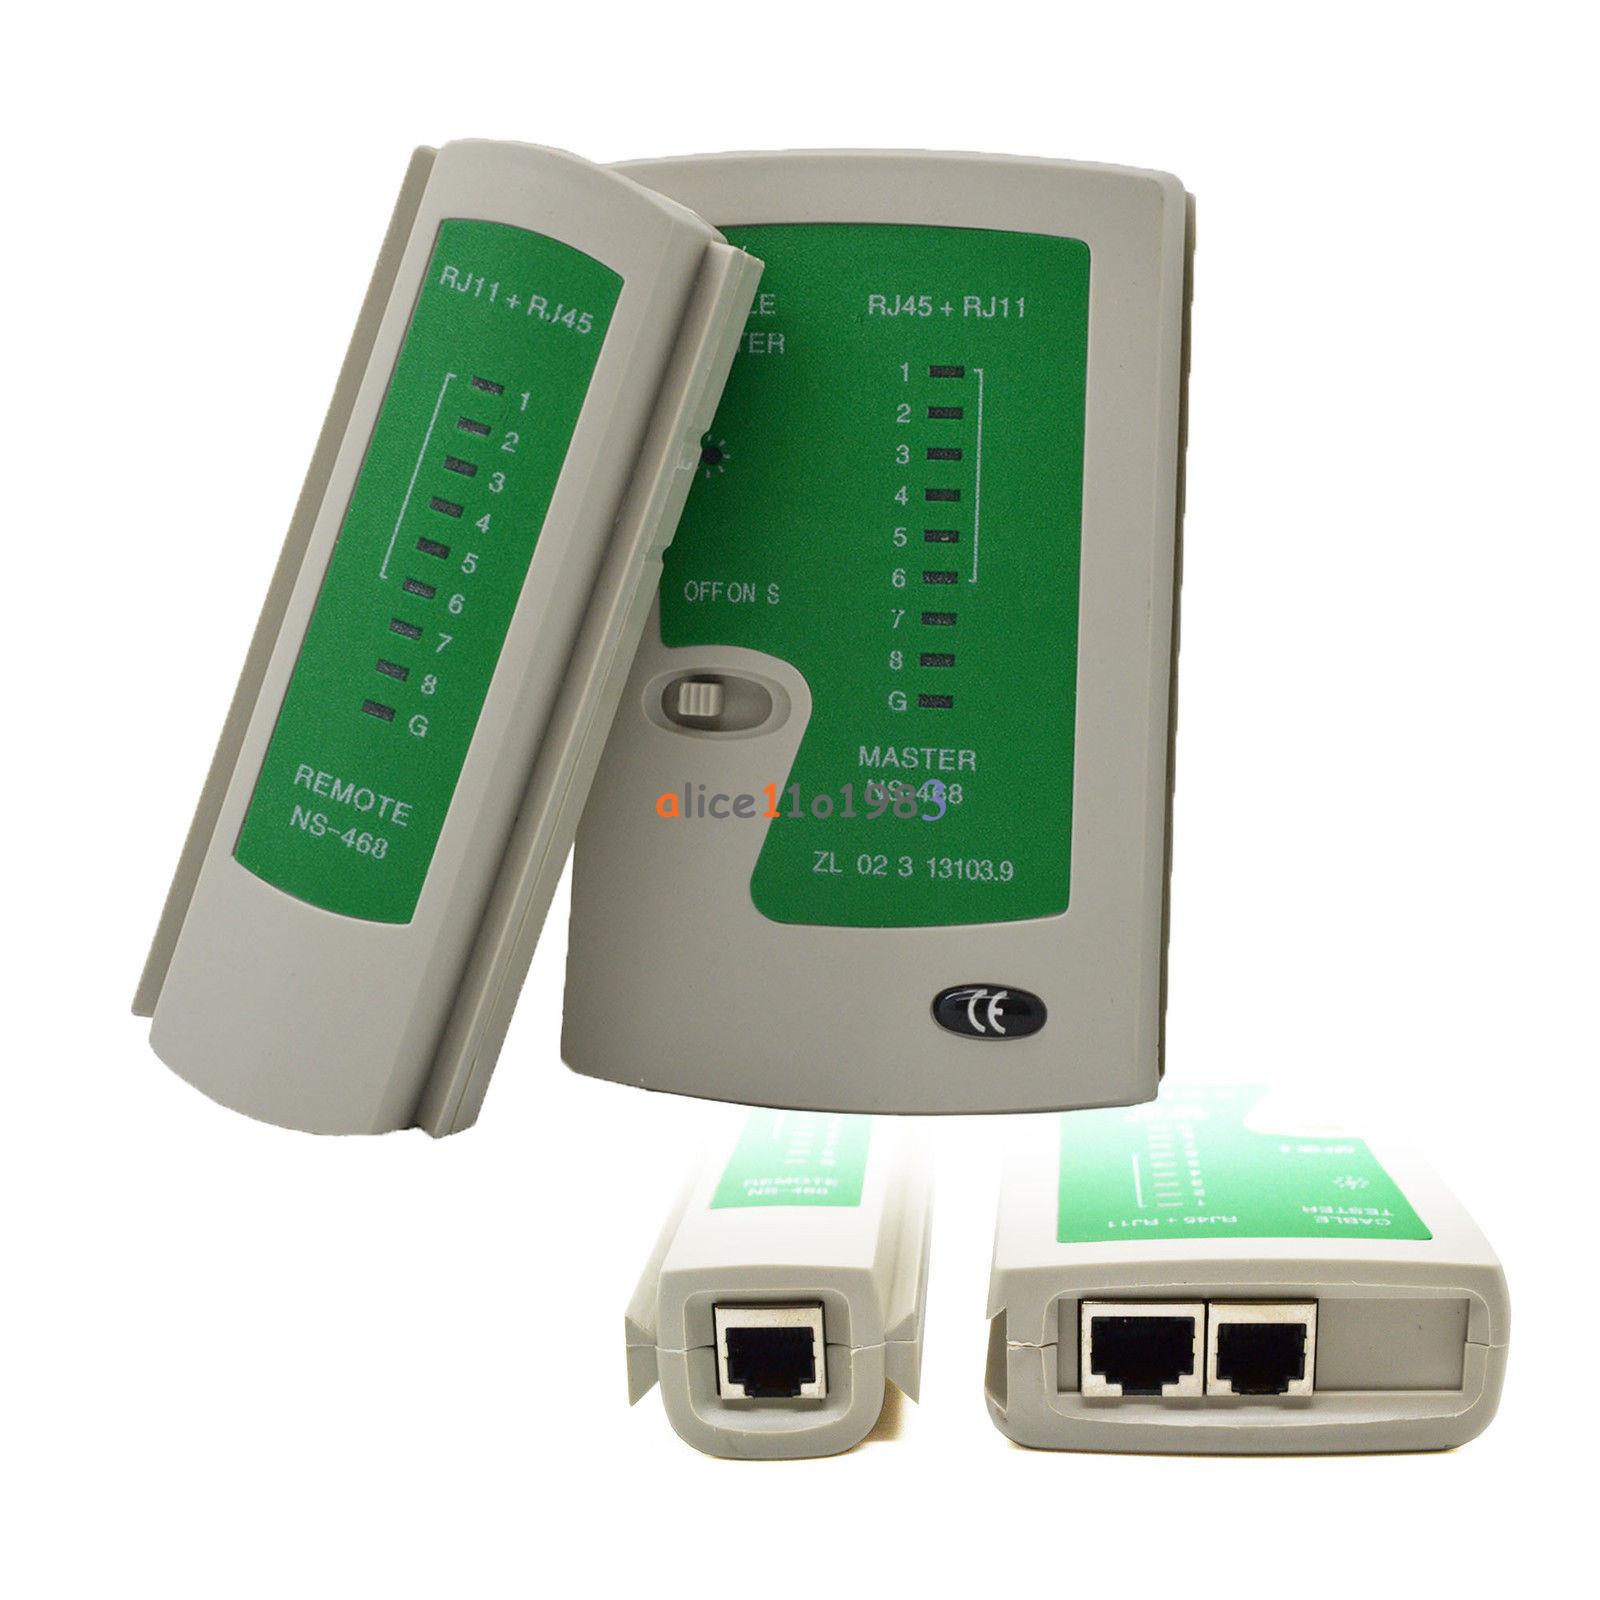 Cat 5 Tester : Professional rj cat e super network lan cable